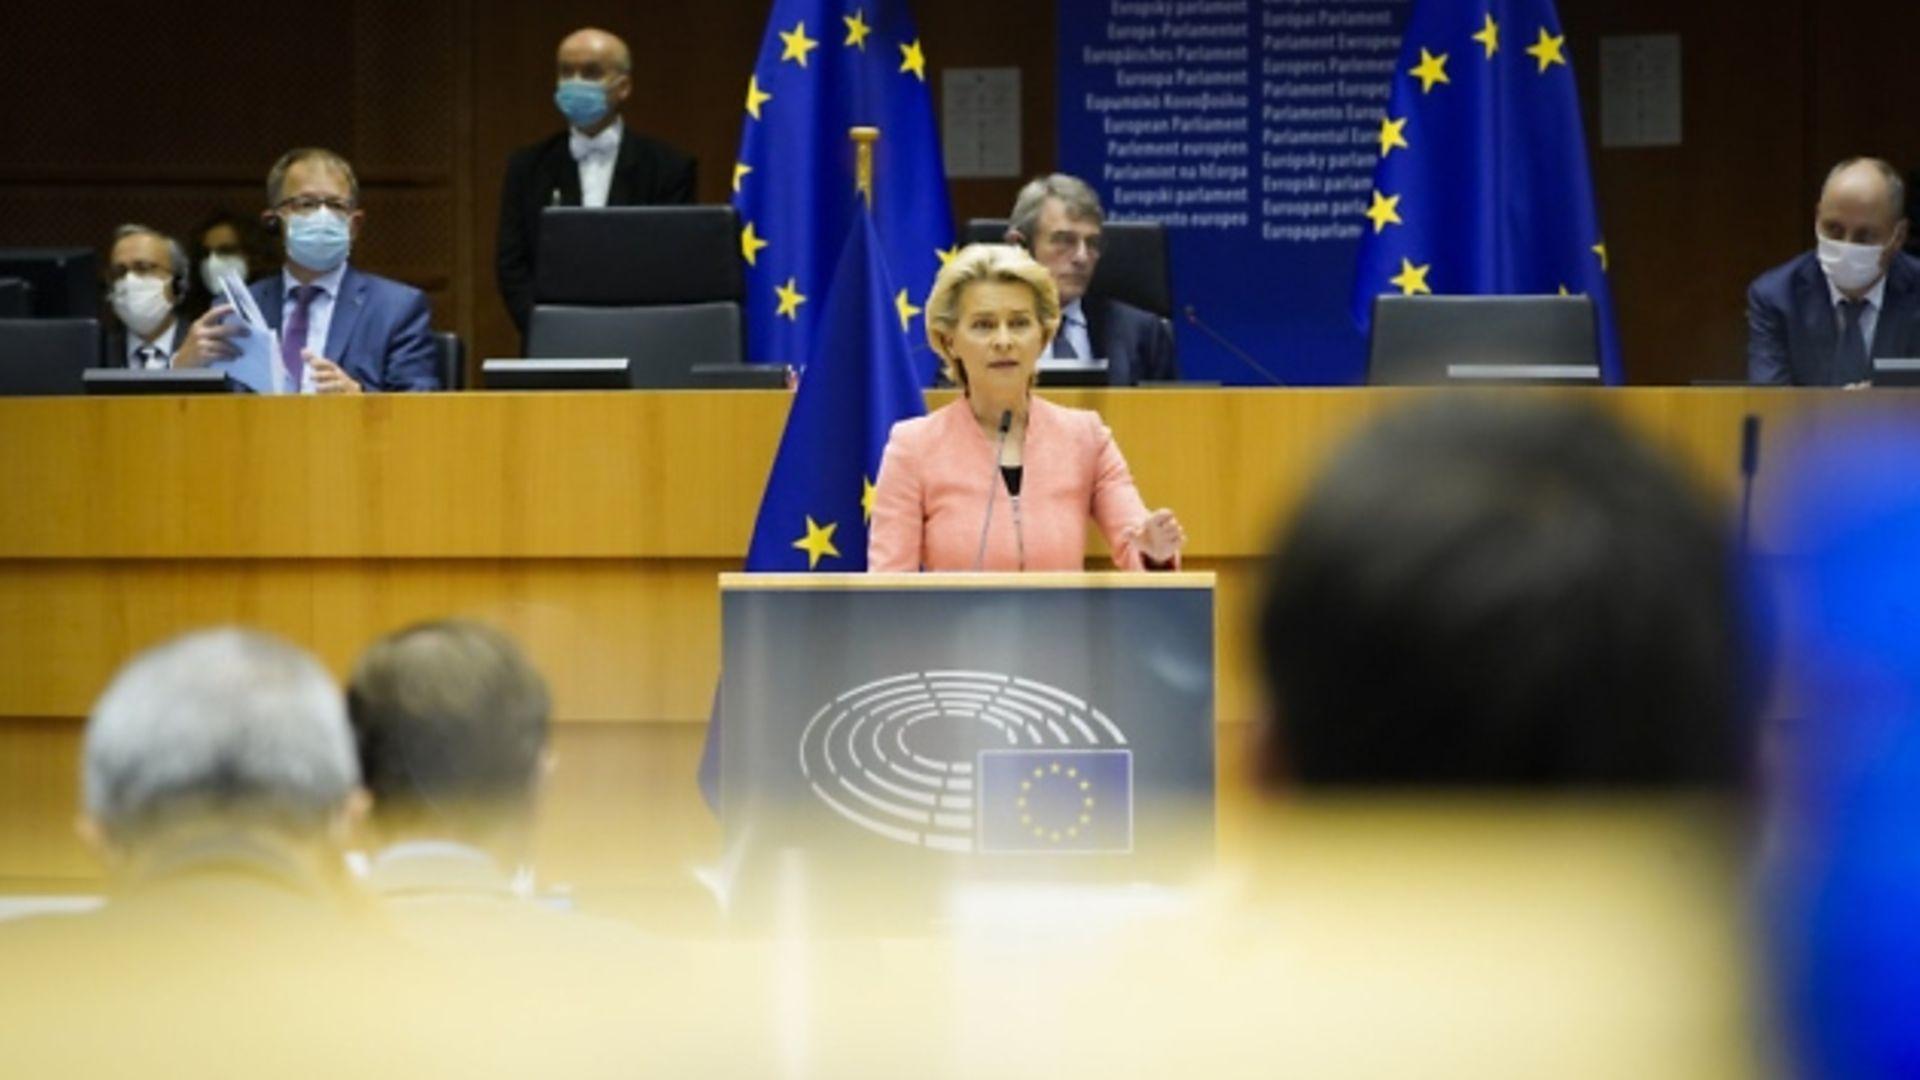 Ursula von der Leyen addresses MEPs. Photograph: Daina LE LARDIC/European Parliament.